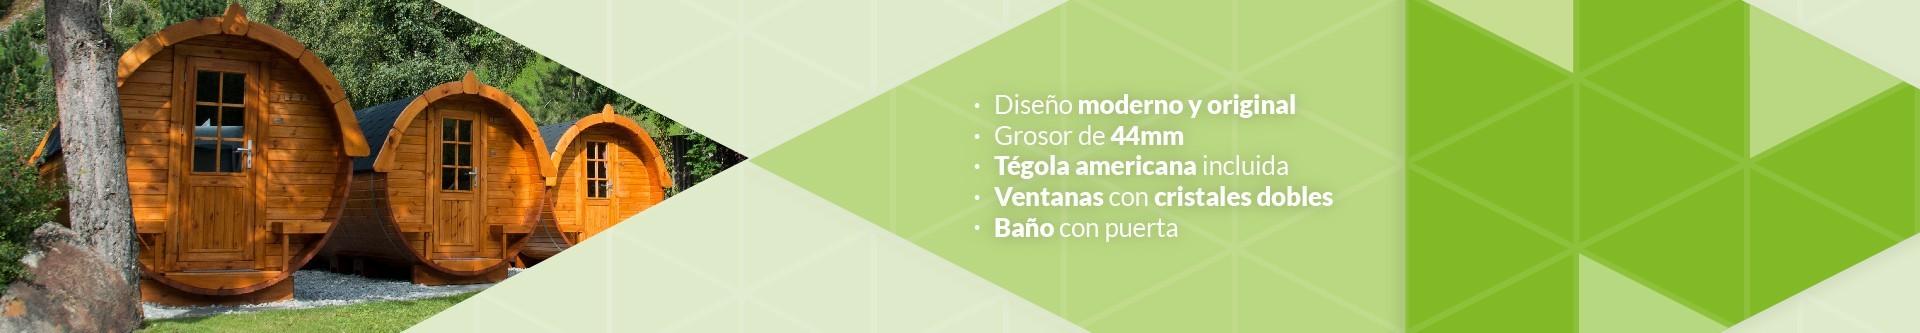 Casetas Barril (Camping Barril)